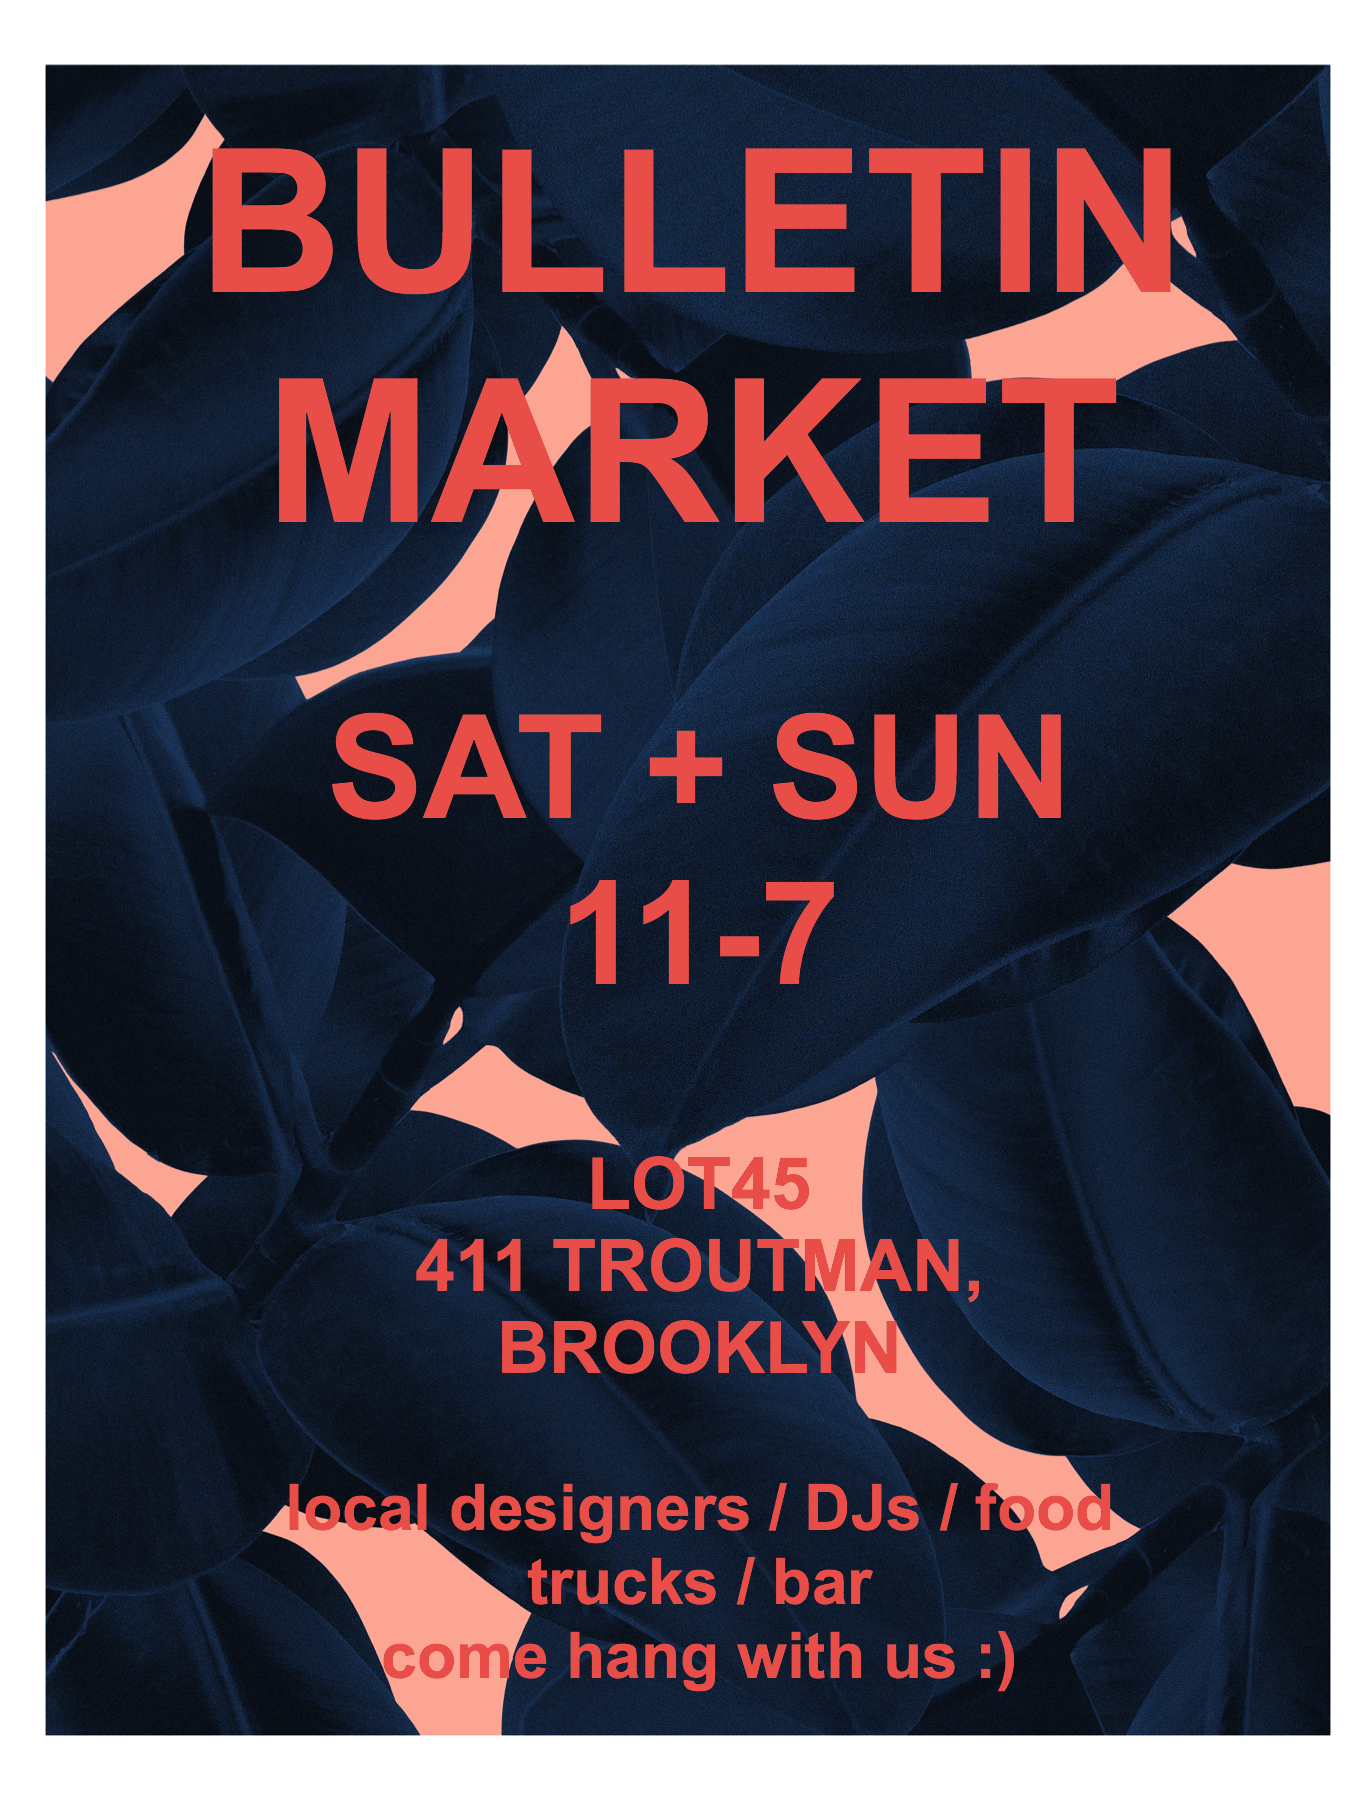 bulletin-market-weekend-brooklyn-june-lot45-everyday-cloth-napkins